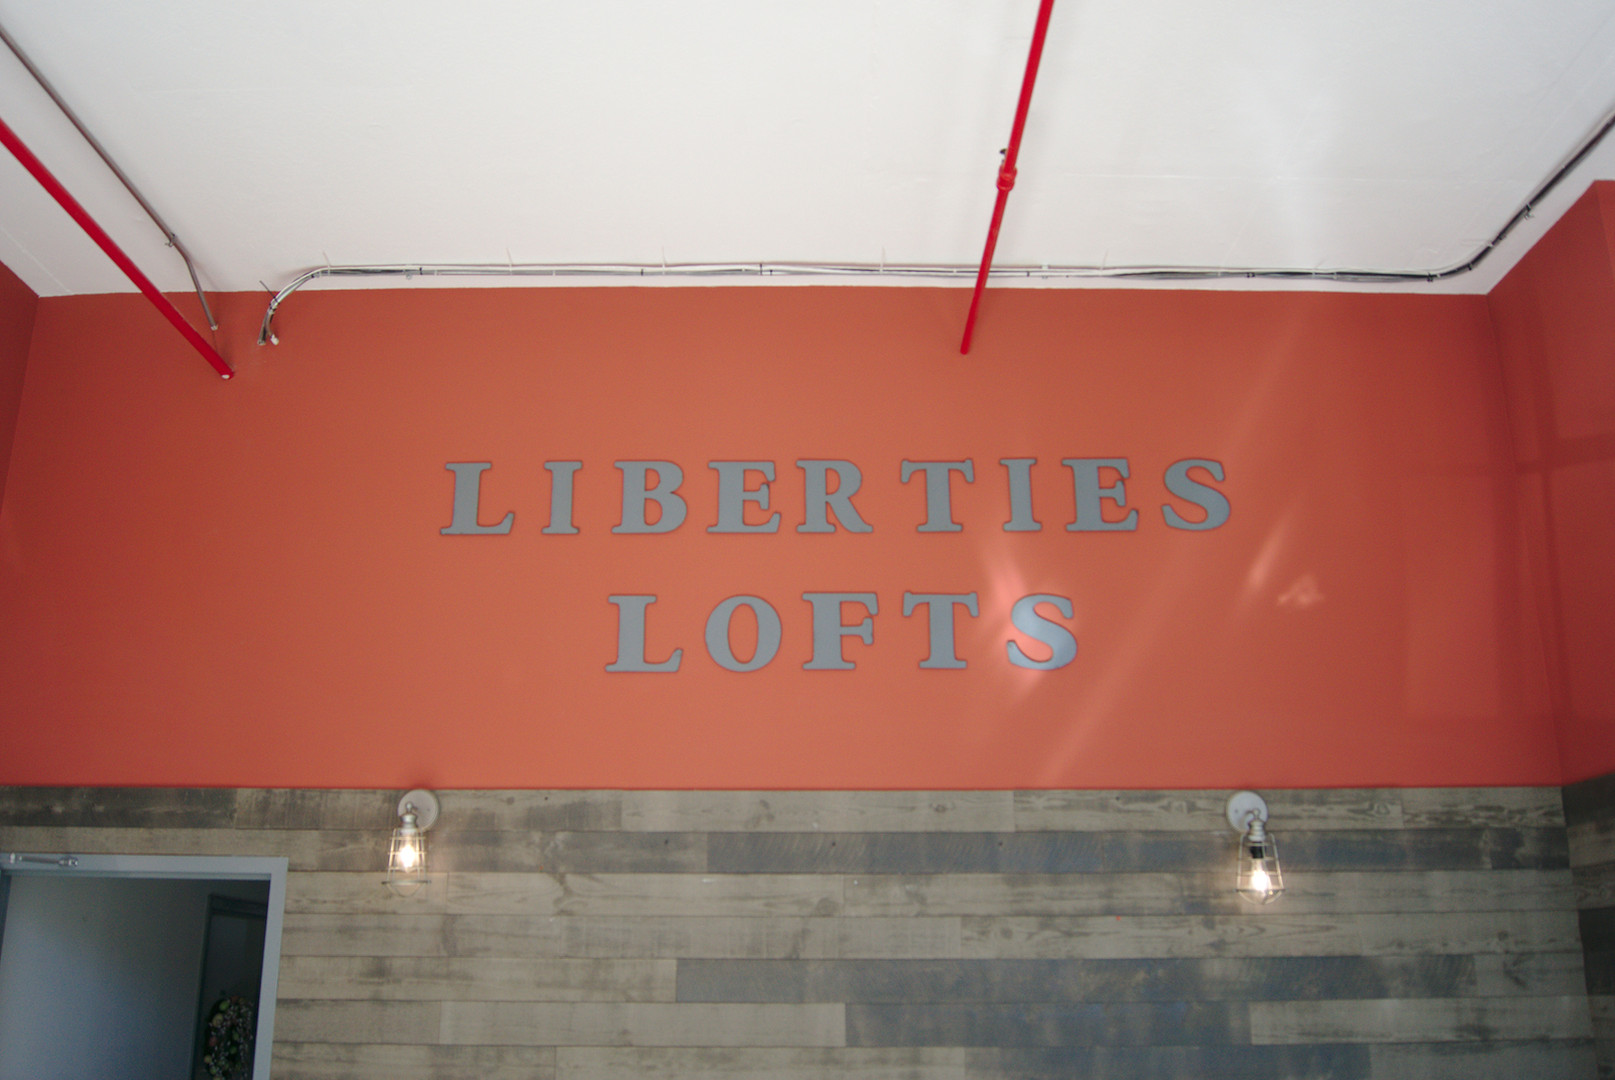 Liberties Lofts